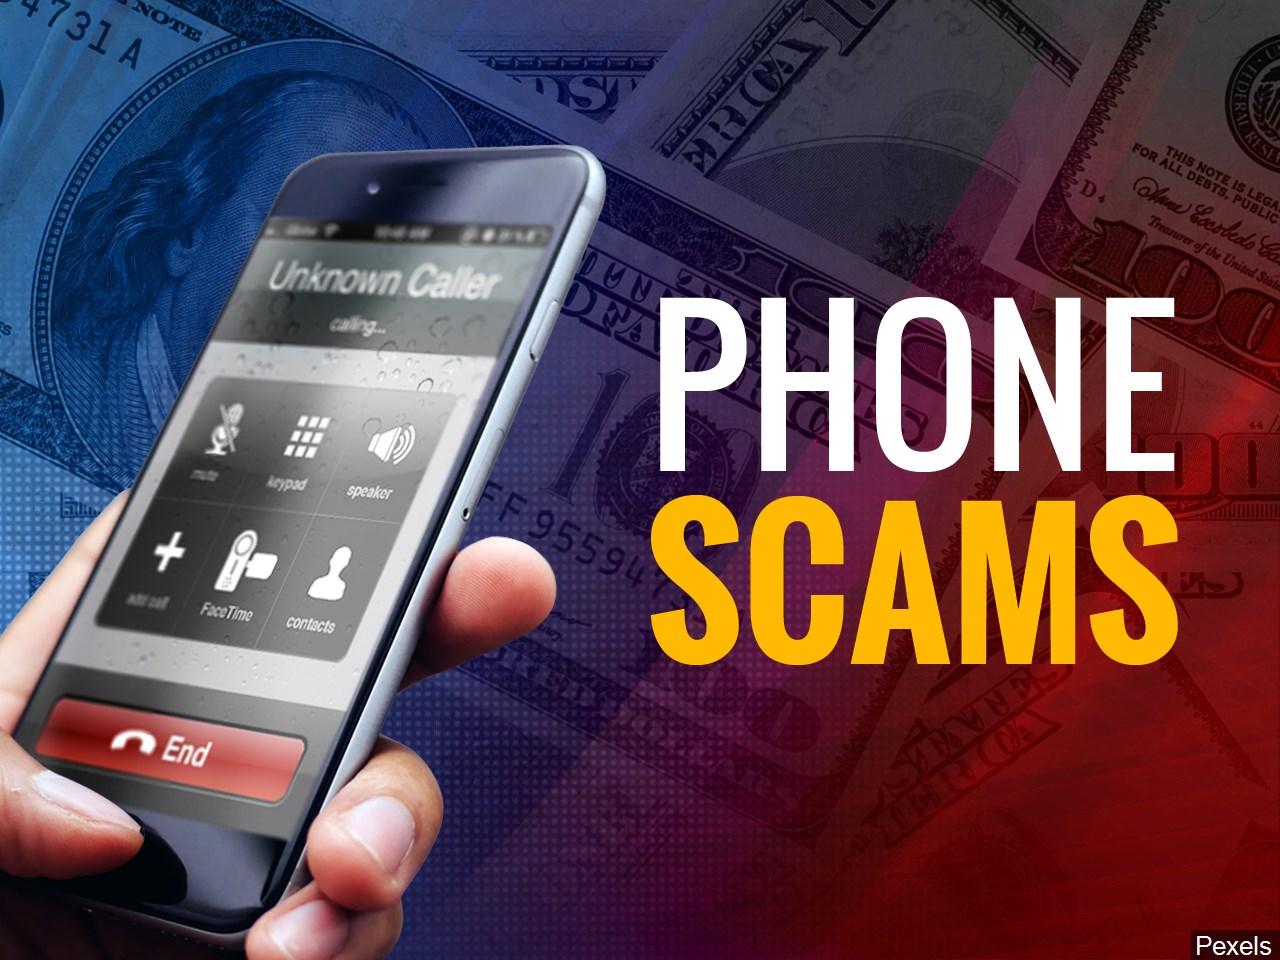 phone scam_1.jpg